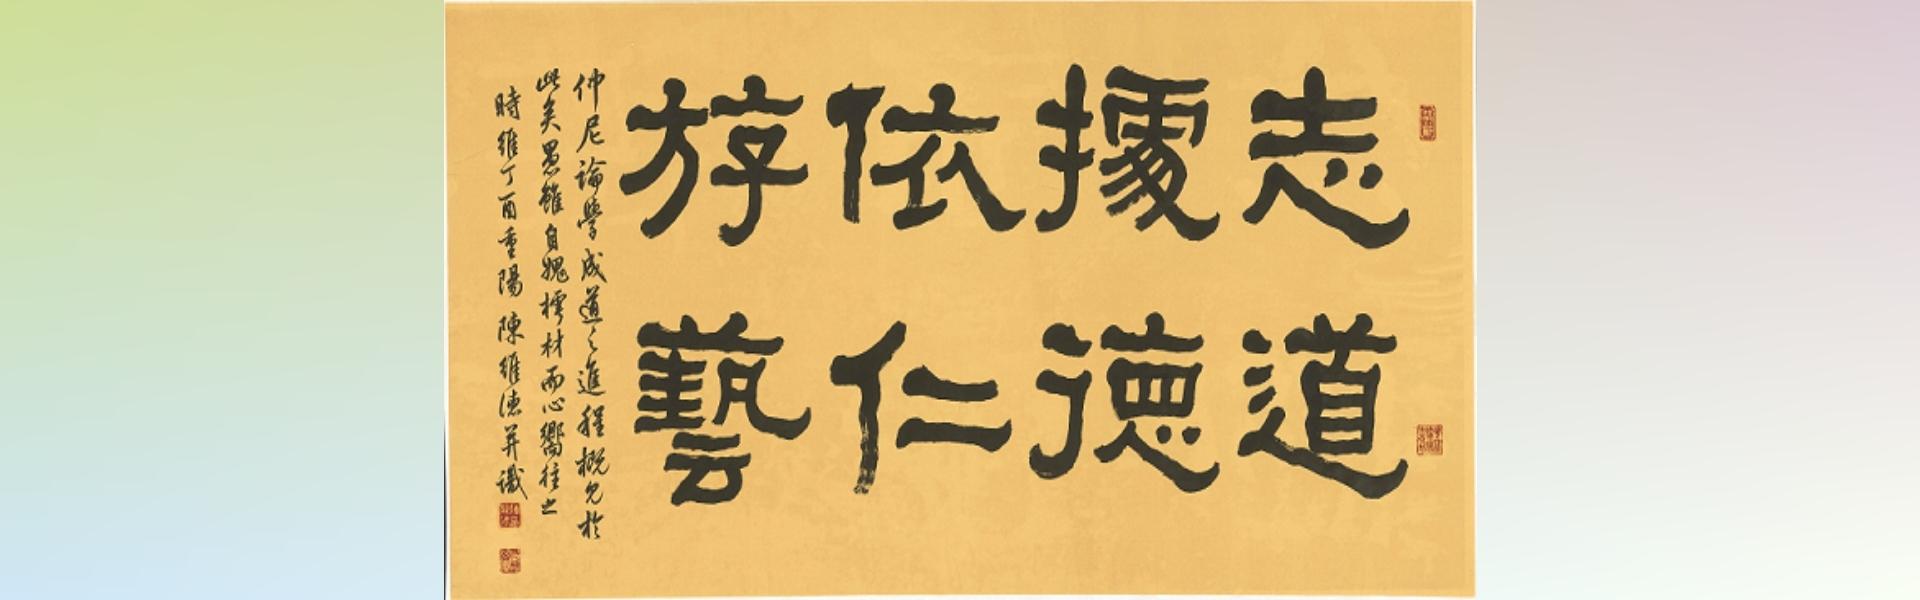 banner11[另開新視窗]